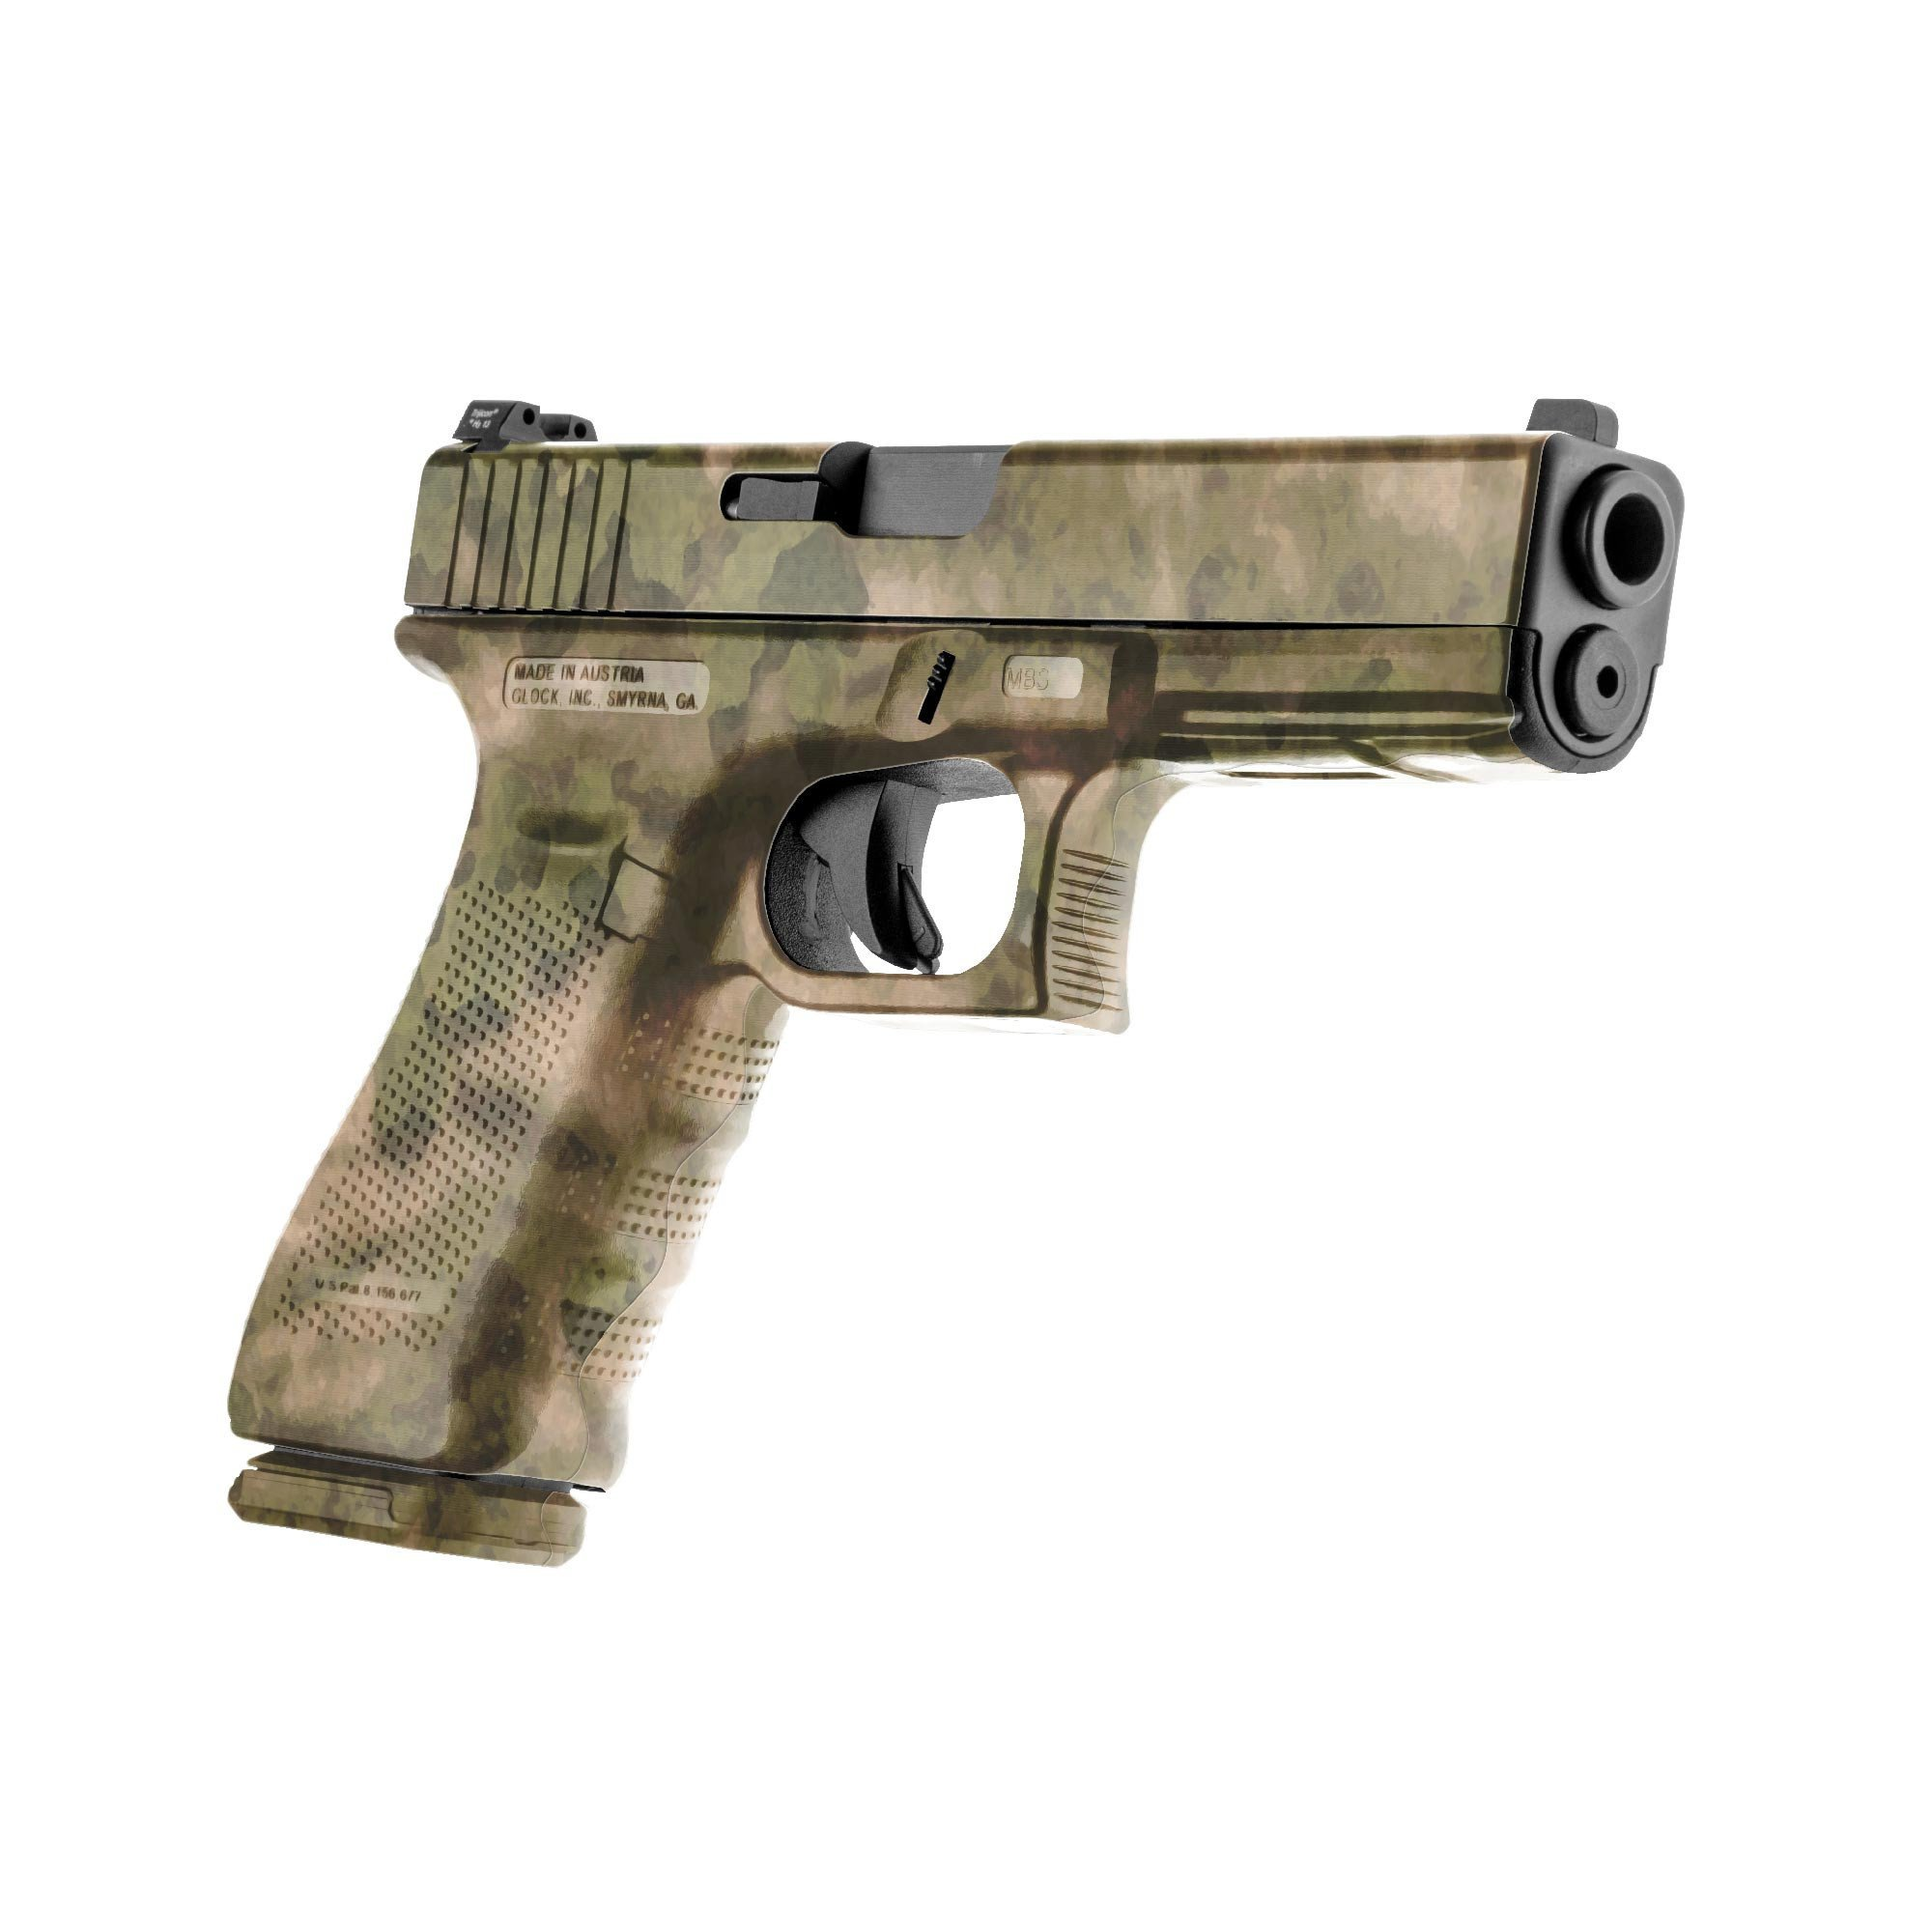 GunSkins Pistol Skin Camouflage Kit DIY Vinyl Handgun Wrap with precut Pieces (A-TACS FG) by GunSkins